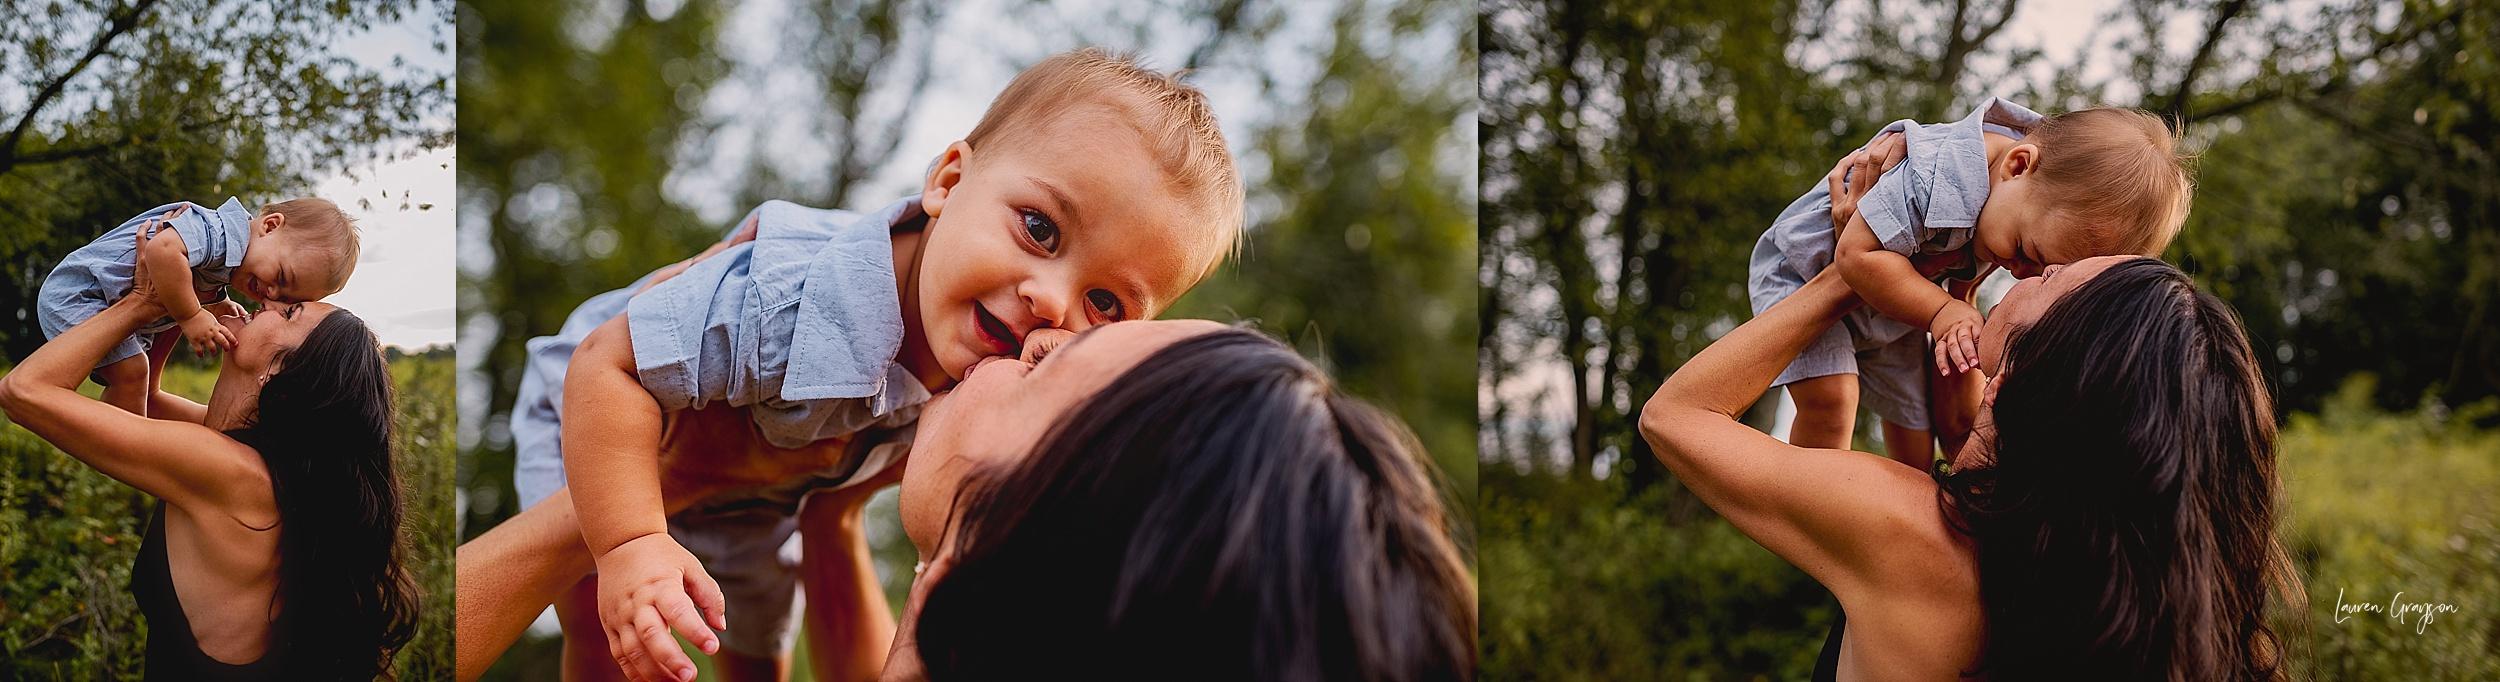 lauren-grayson-photography-cleveland-ohio-photographer-AKRON-family-photos-springfield-bog-cullin-first-birthday_0809.jpg